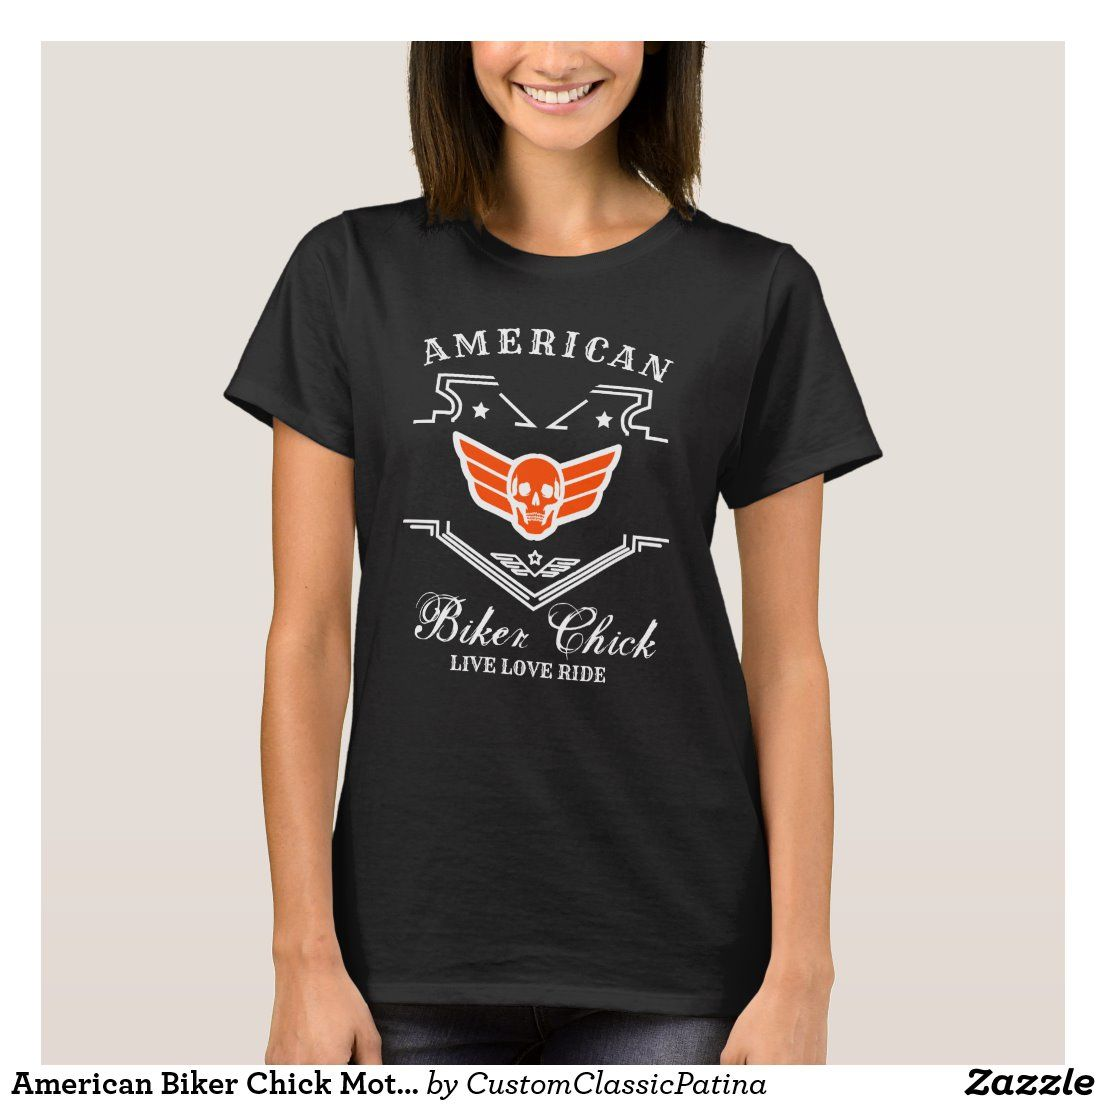 American Biker Chick Motorcycle Woman Rider T-Shirt | Zazzle.com